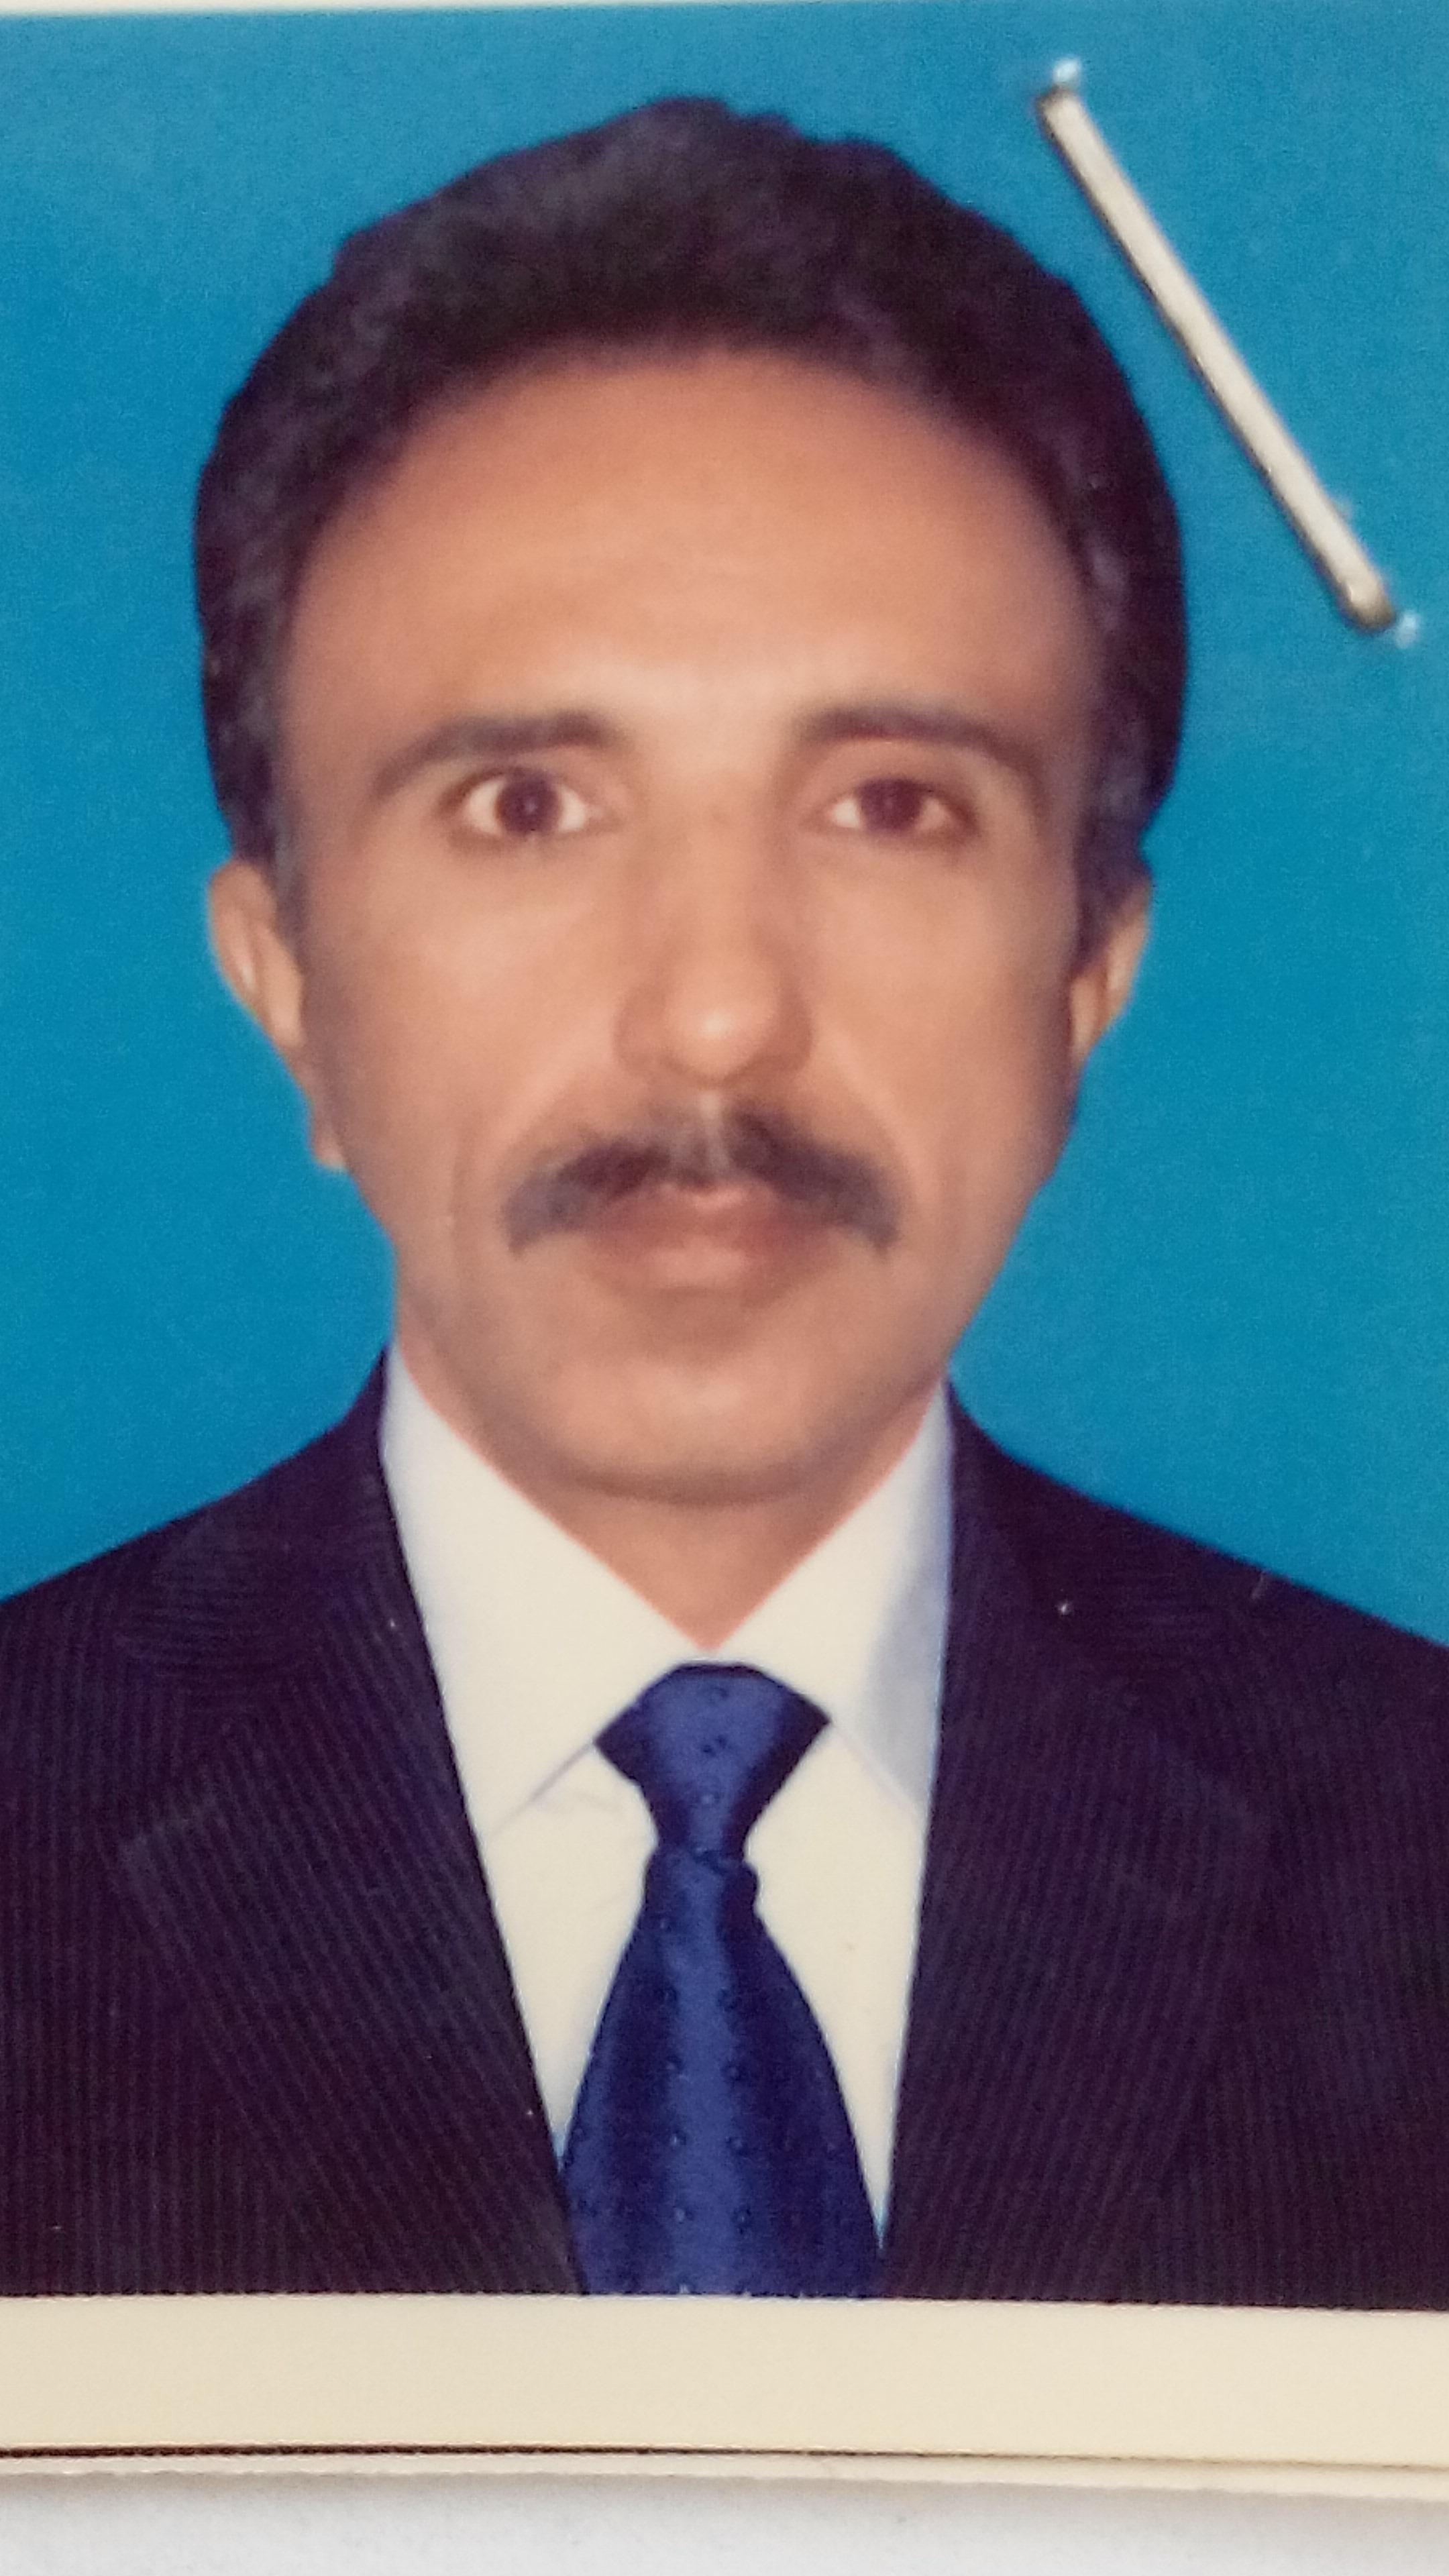 Asad Laghari Windows Server, Windows Desktop, Apache, Computer Security, System Admin